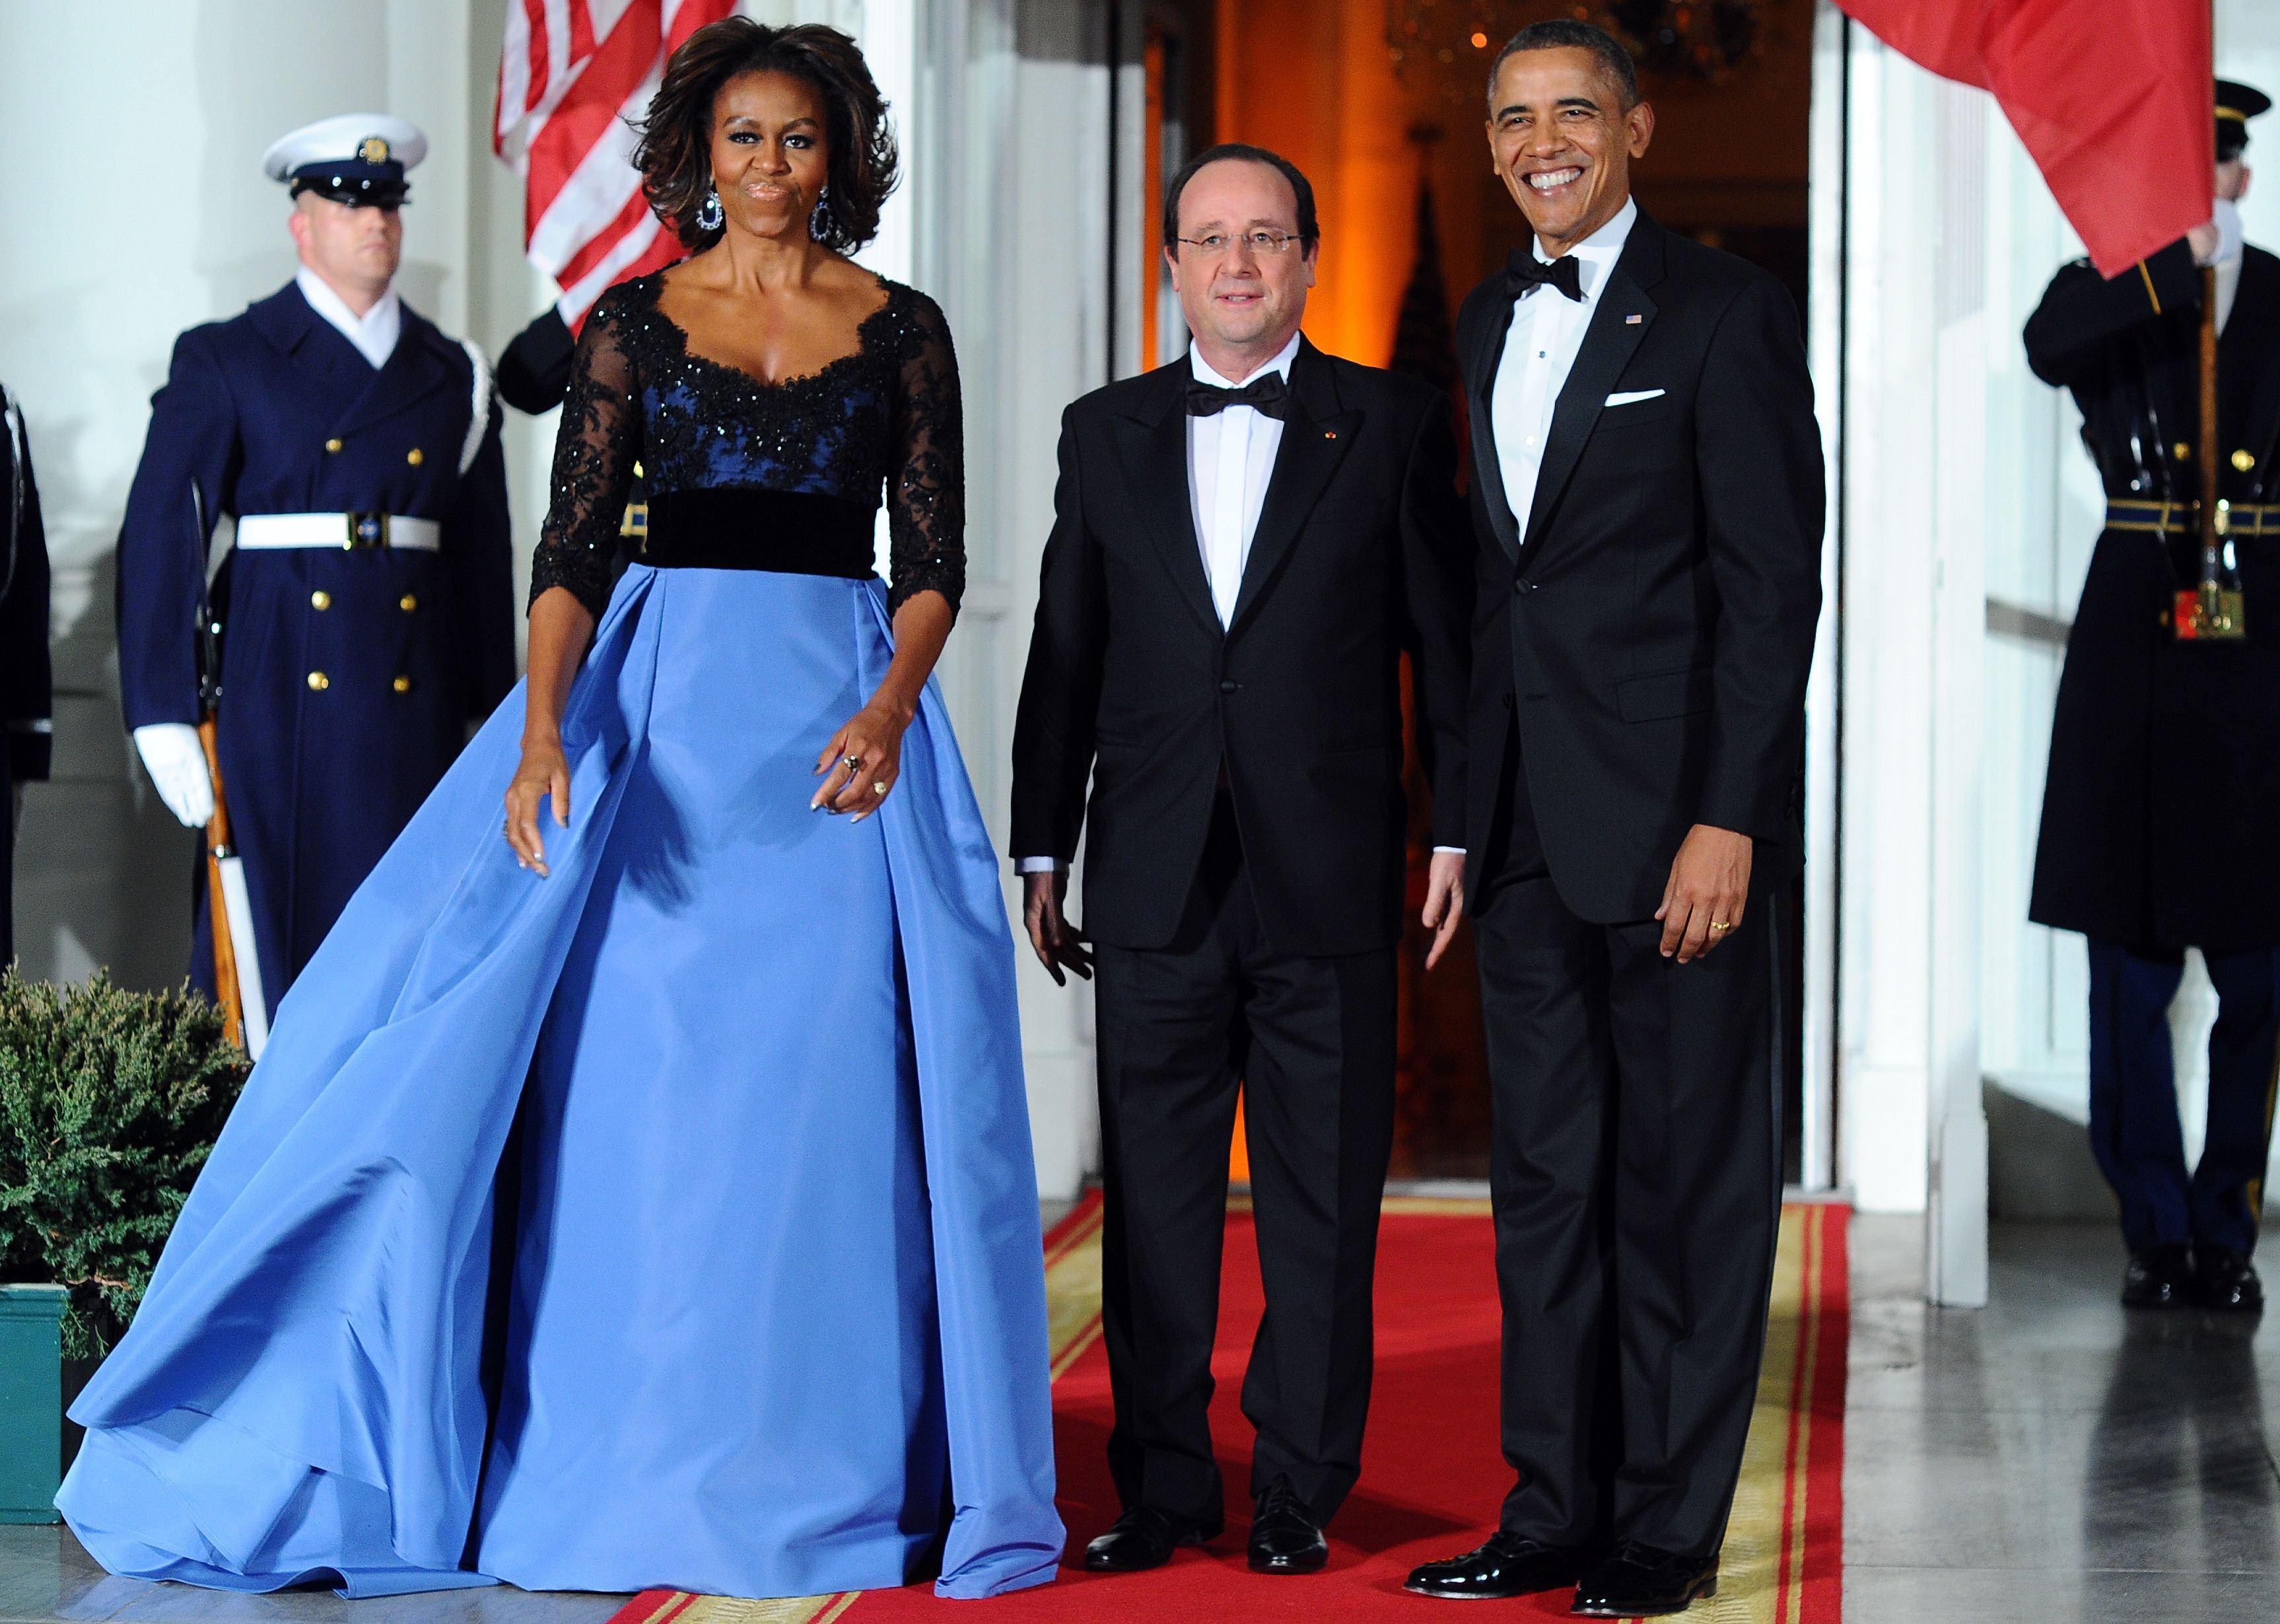 First Lady S Carolina Herrera Dress A Smash At State